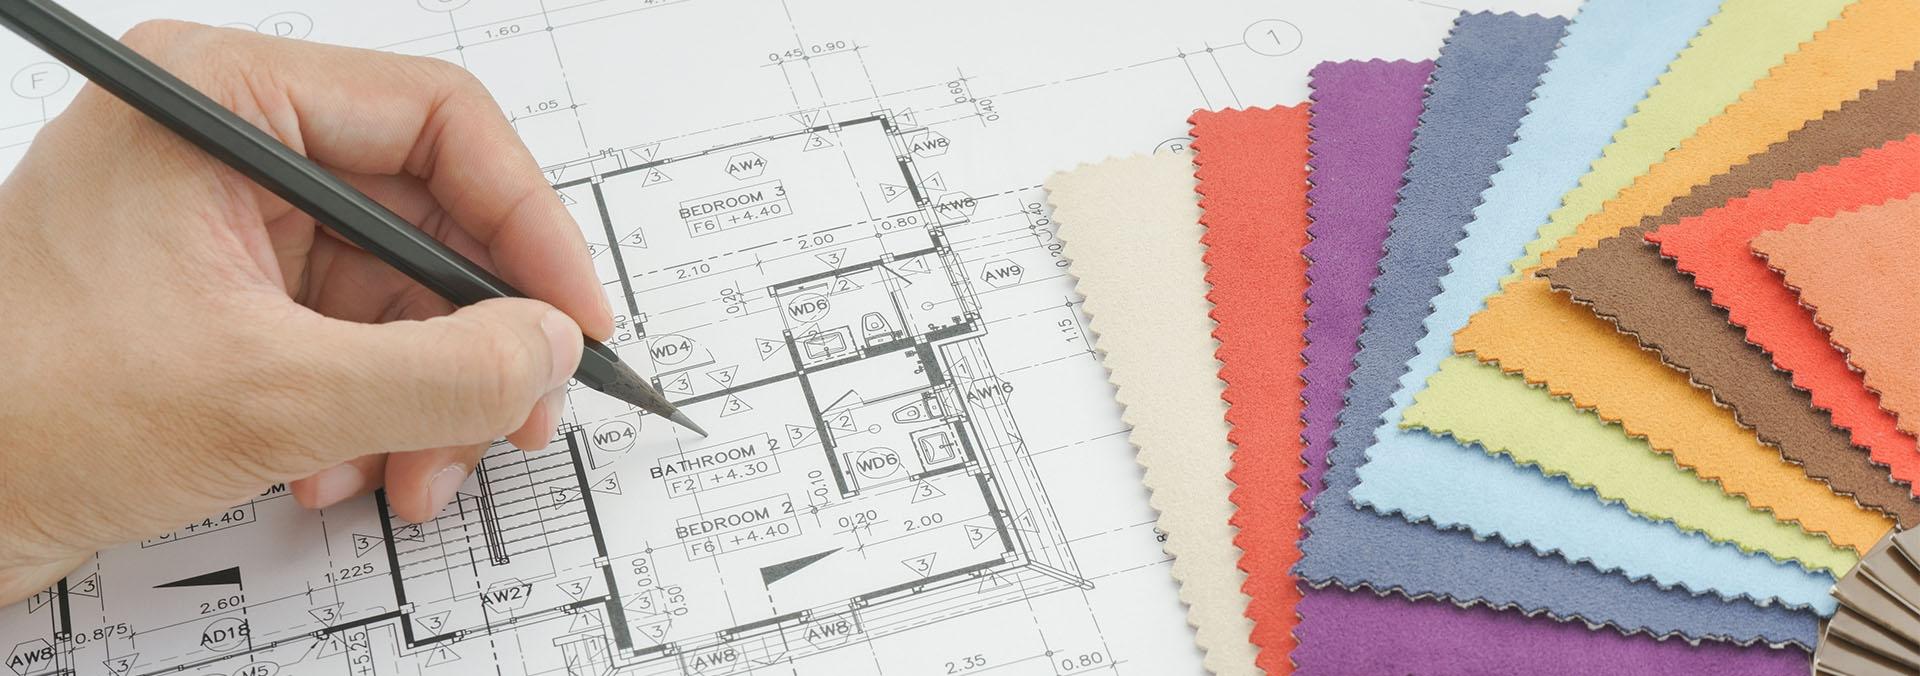 Interior Architecture and Environmental Design